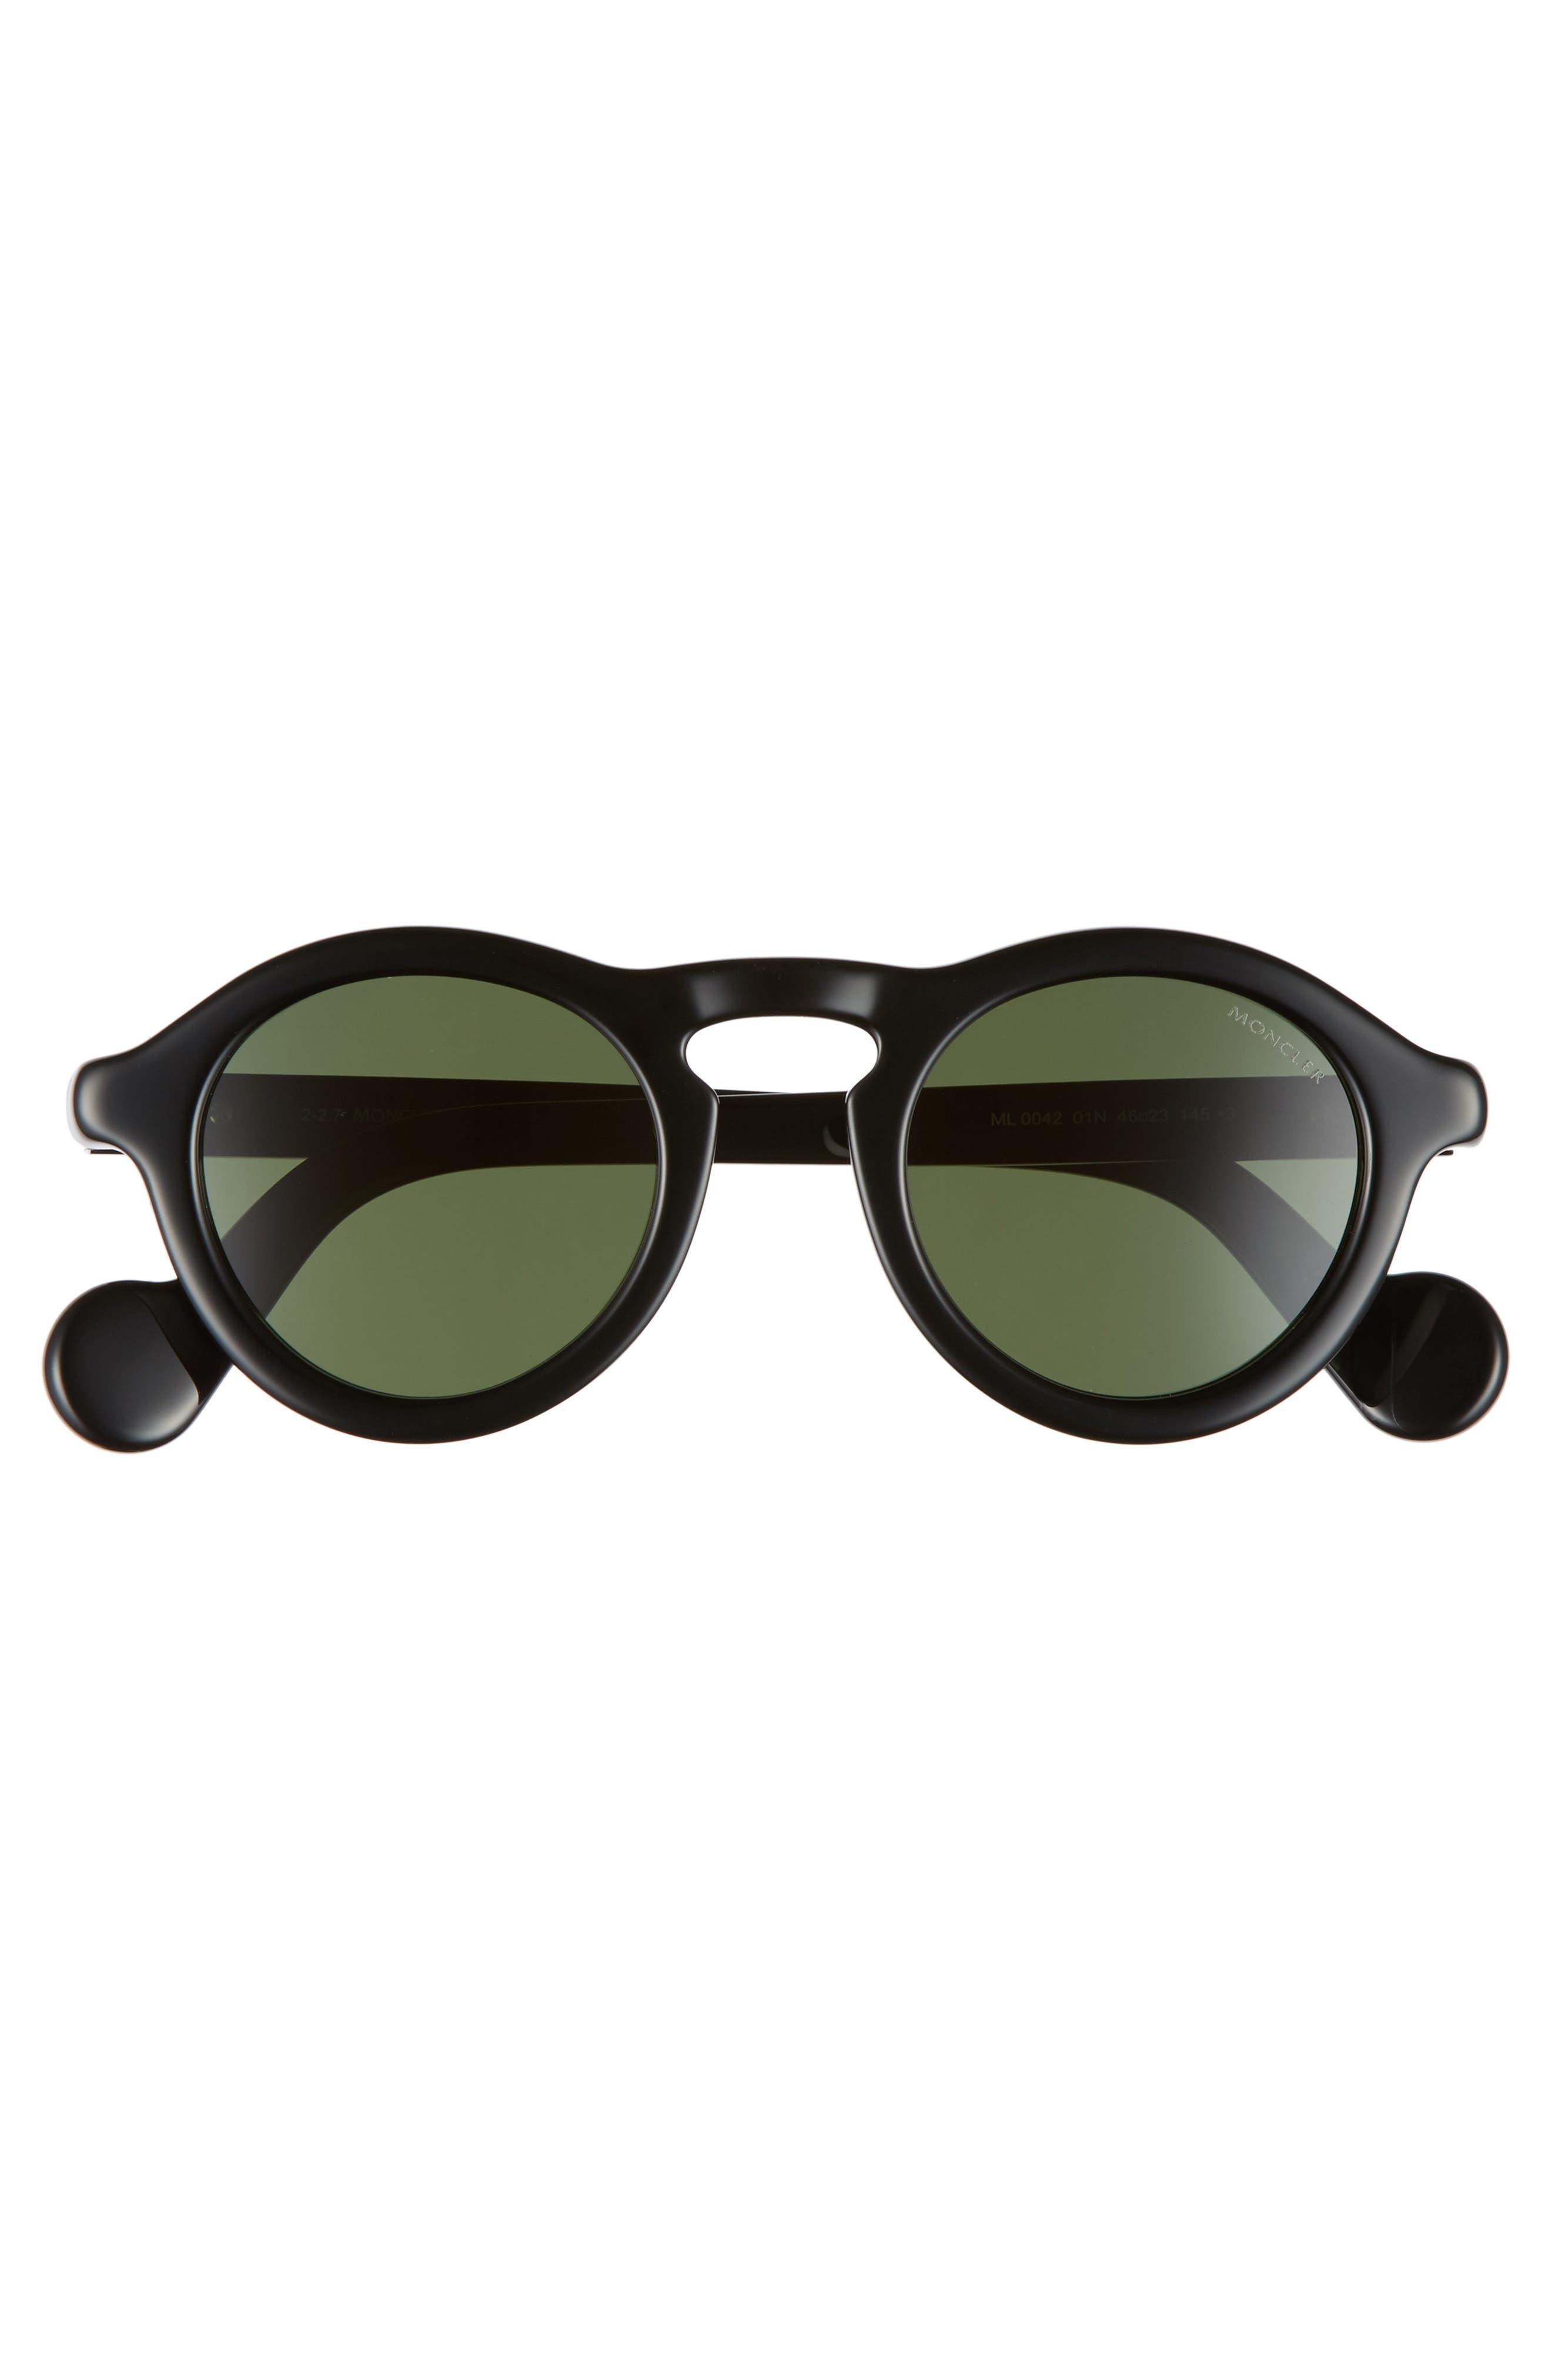 46mm Round Sunglasses,                             Alternate thumbnail 2, color,                             SHINY BLACK/ GREEN